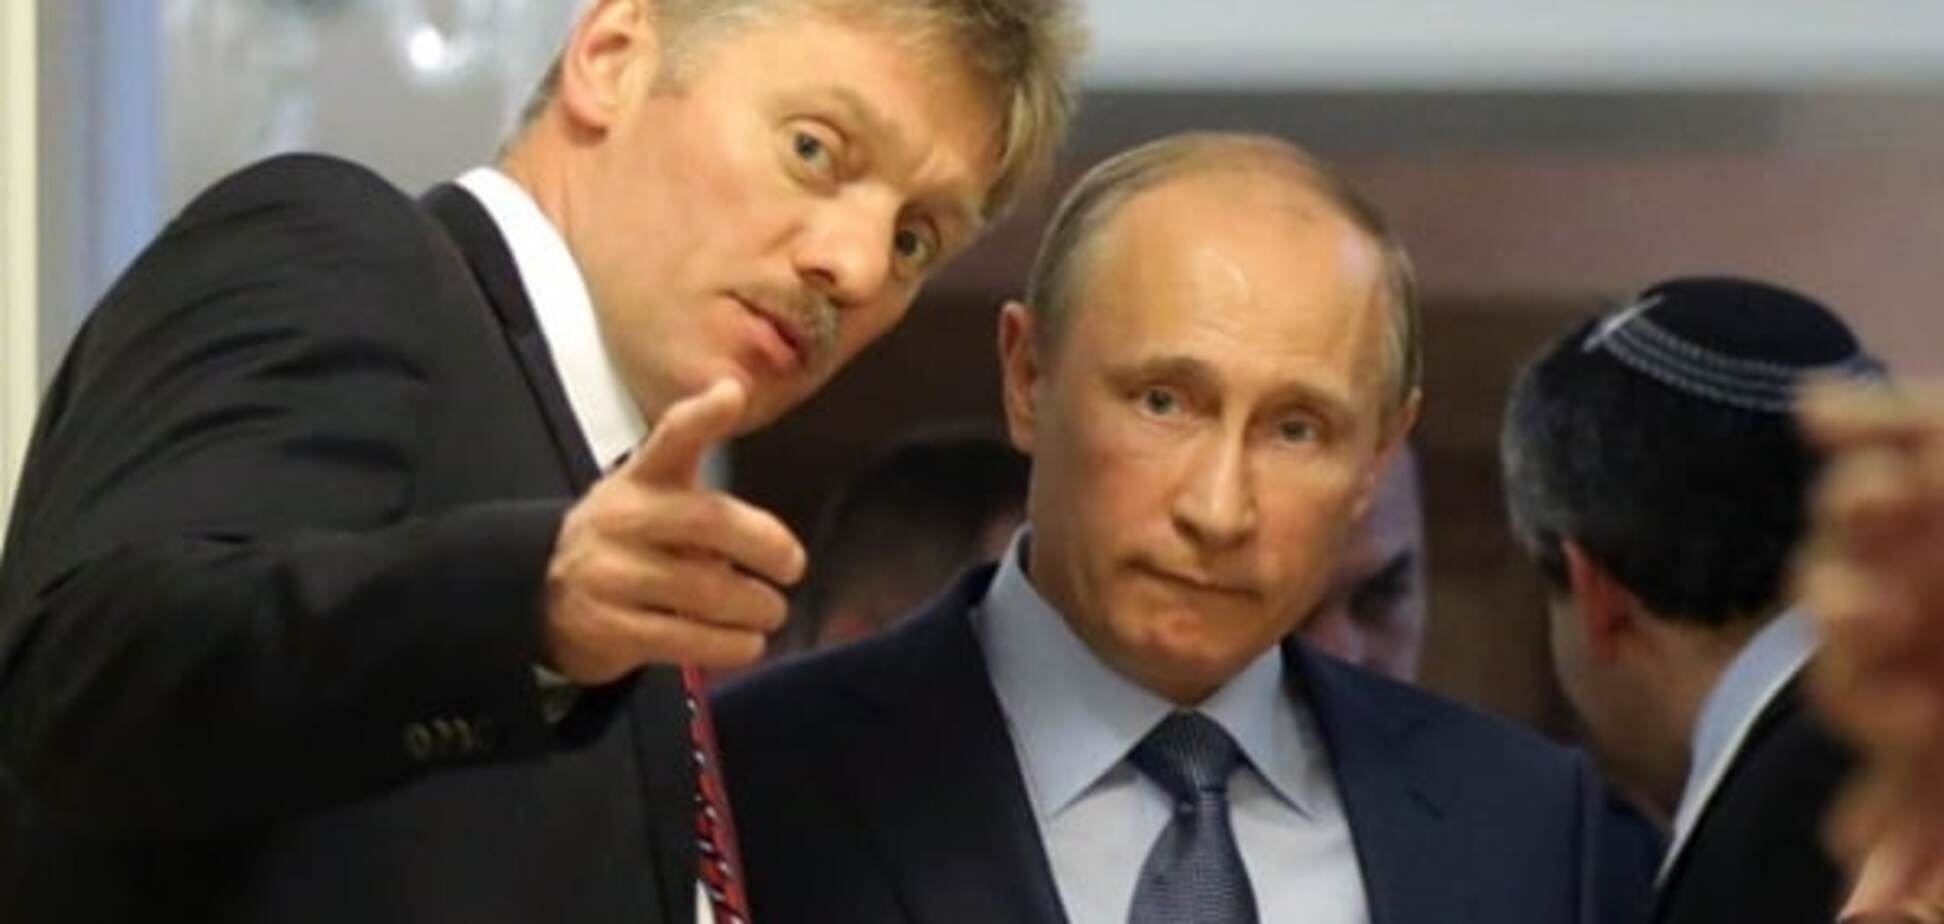 пресс-секретарь президента РФ